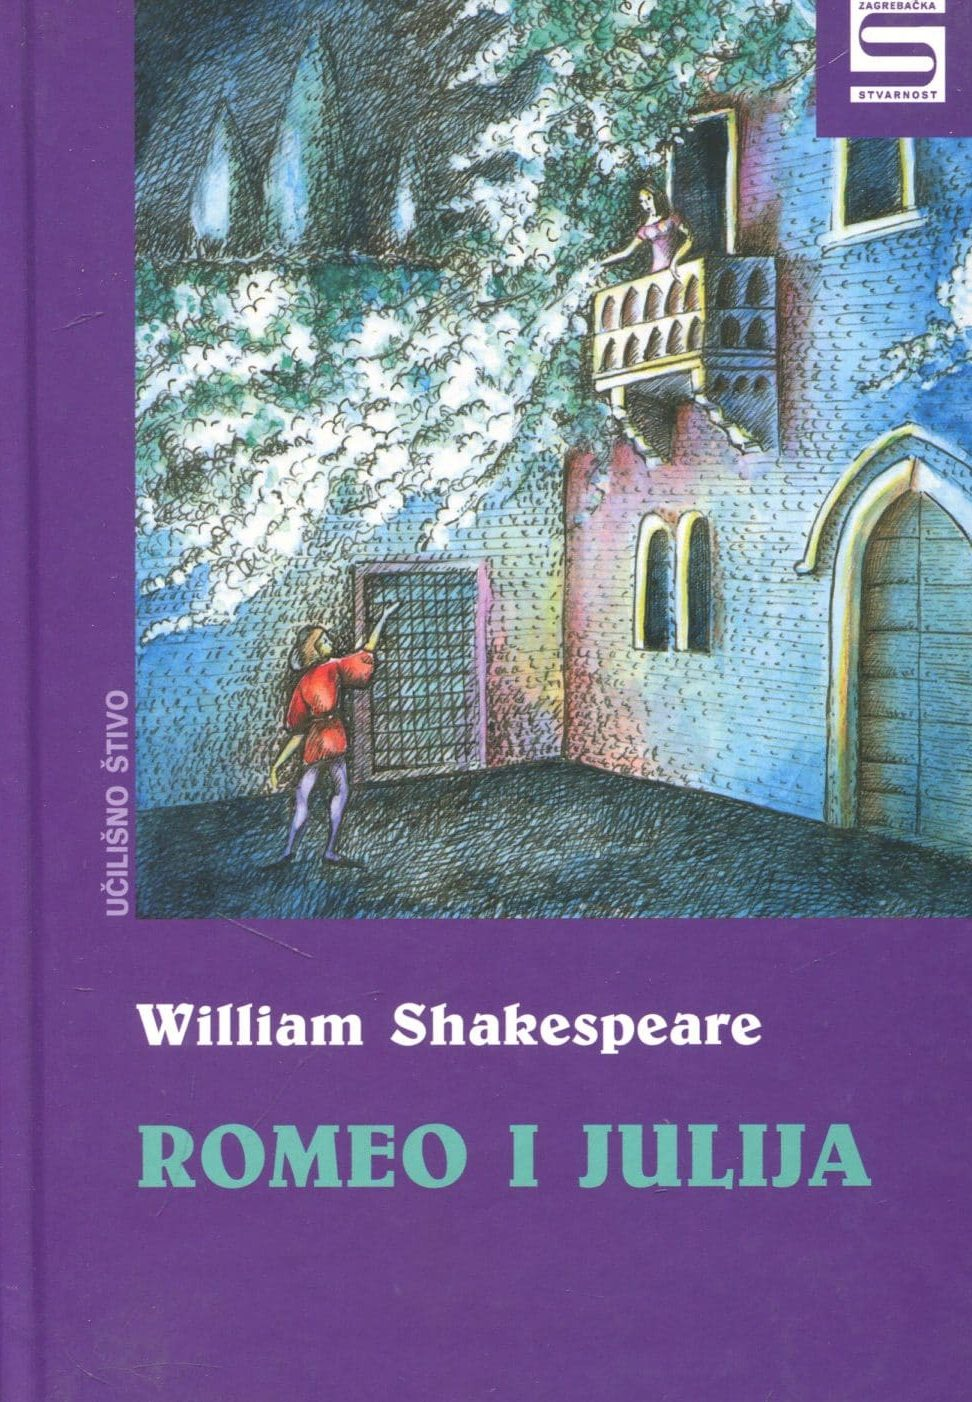 Romeo i Julija Shakespeare William